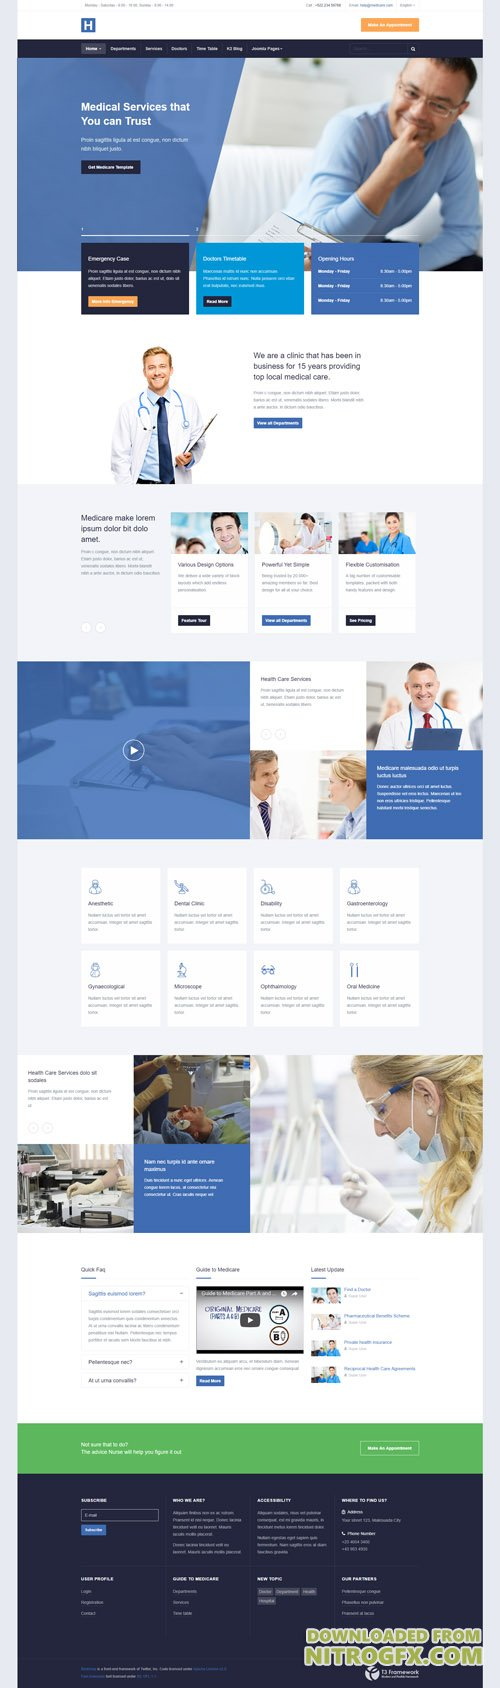 joomlart ja healthcare v1 0 5 fully responsive